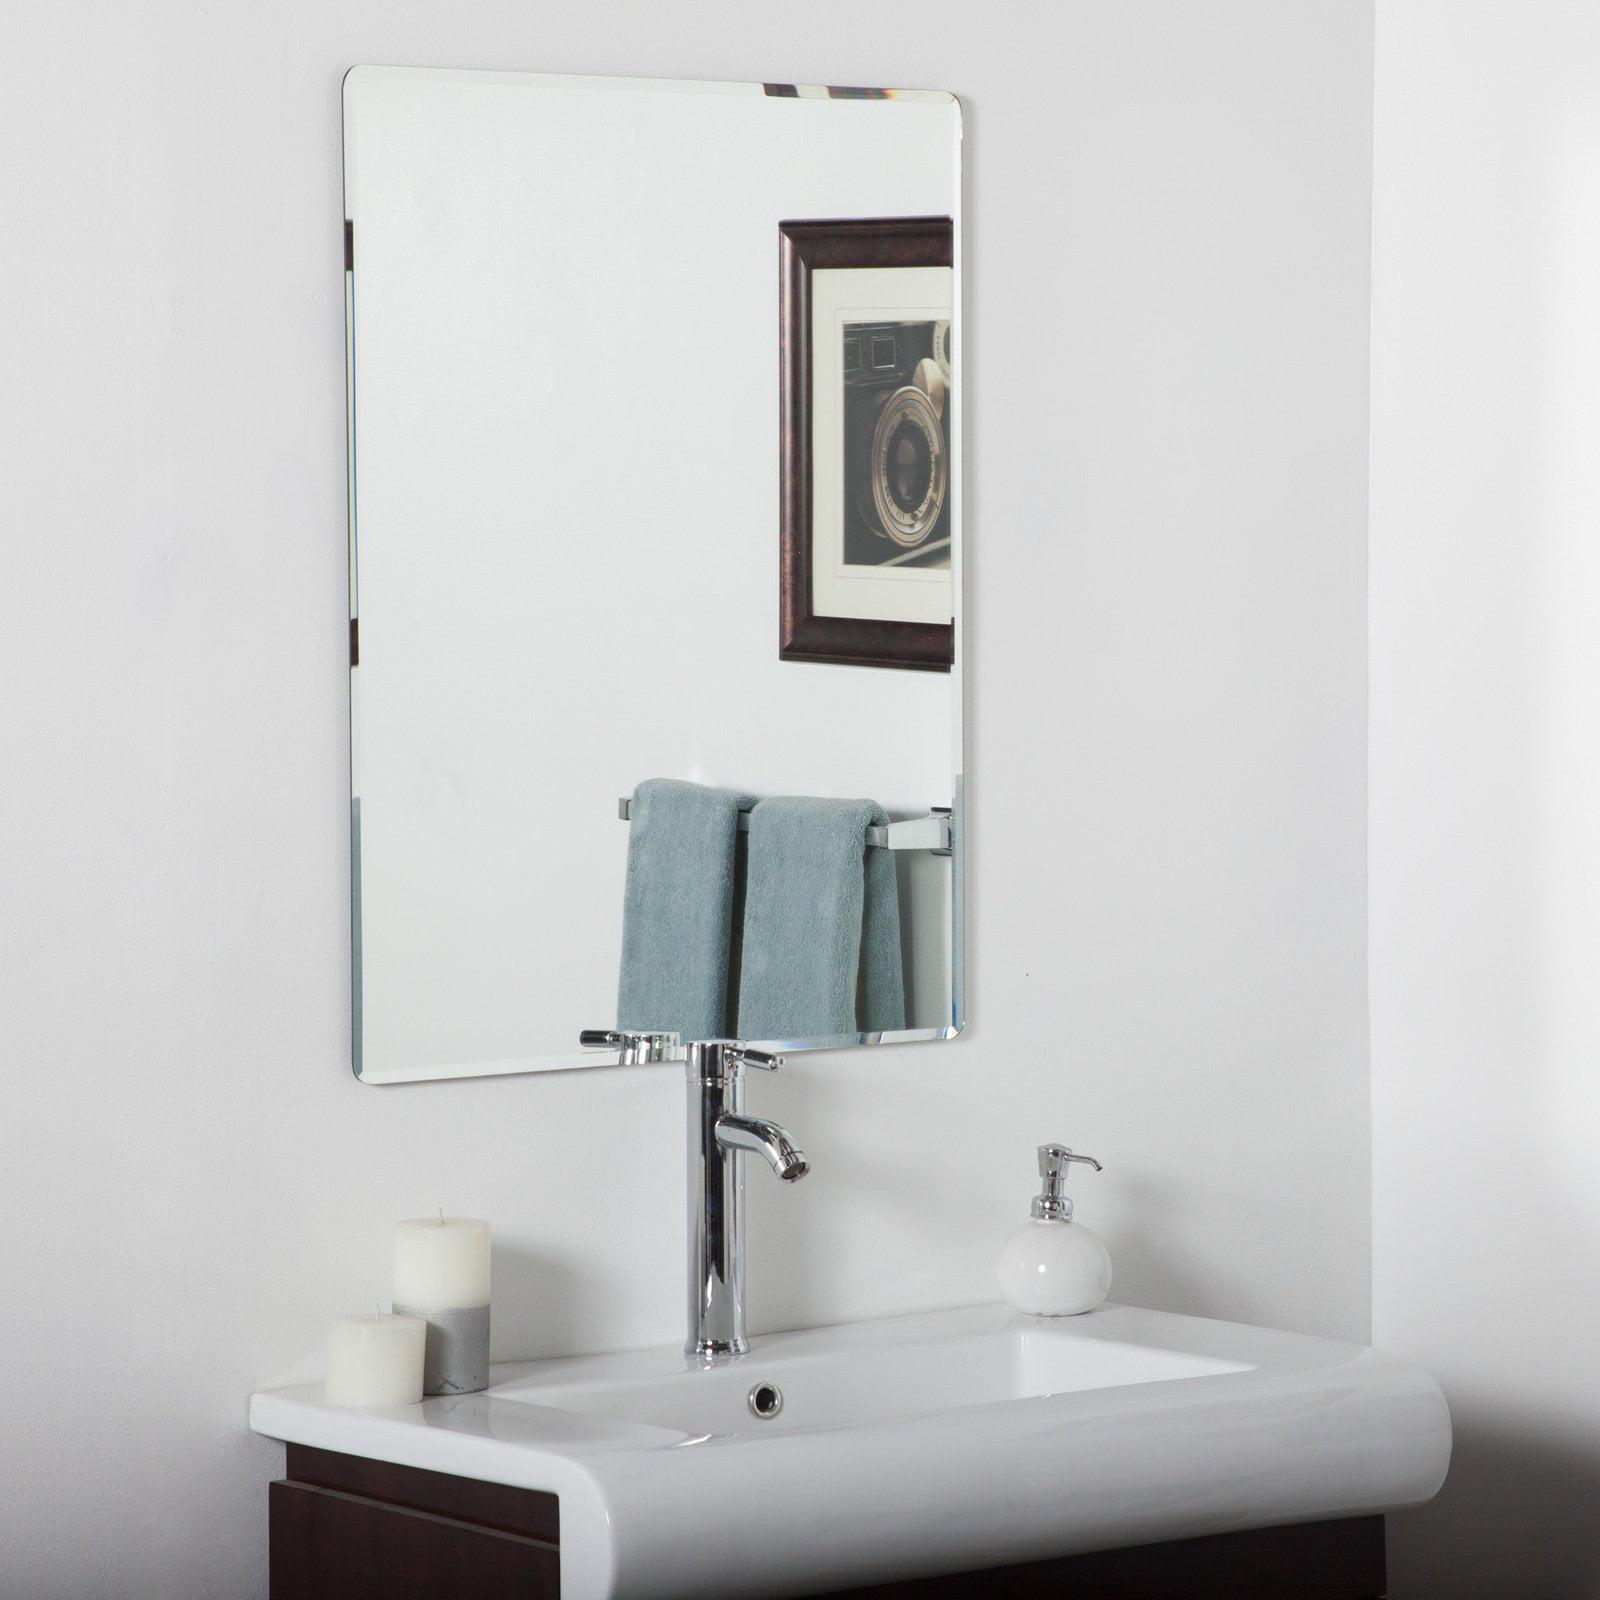 Décor Wonderland Vera Frameless Bathroom Wall Mirror 24W x 32H in. by Decor Wonderland of US